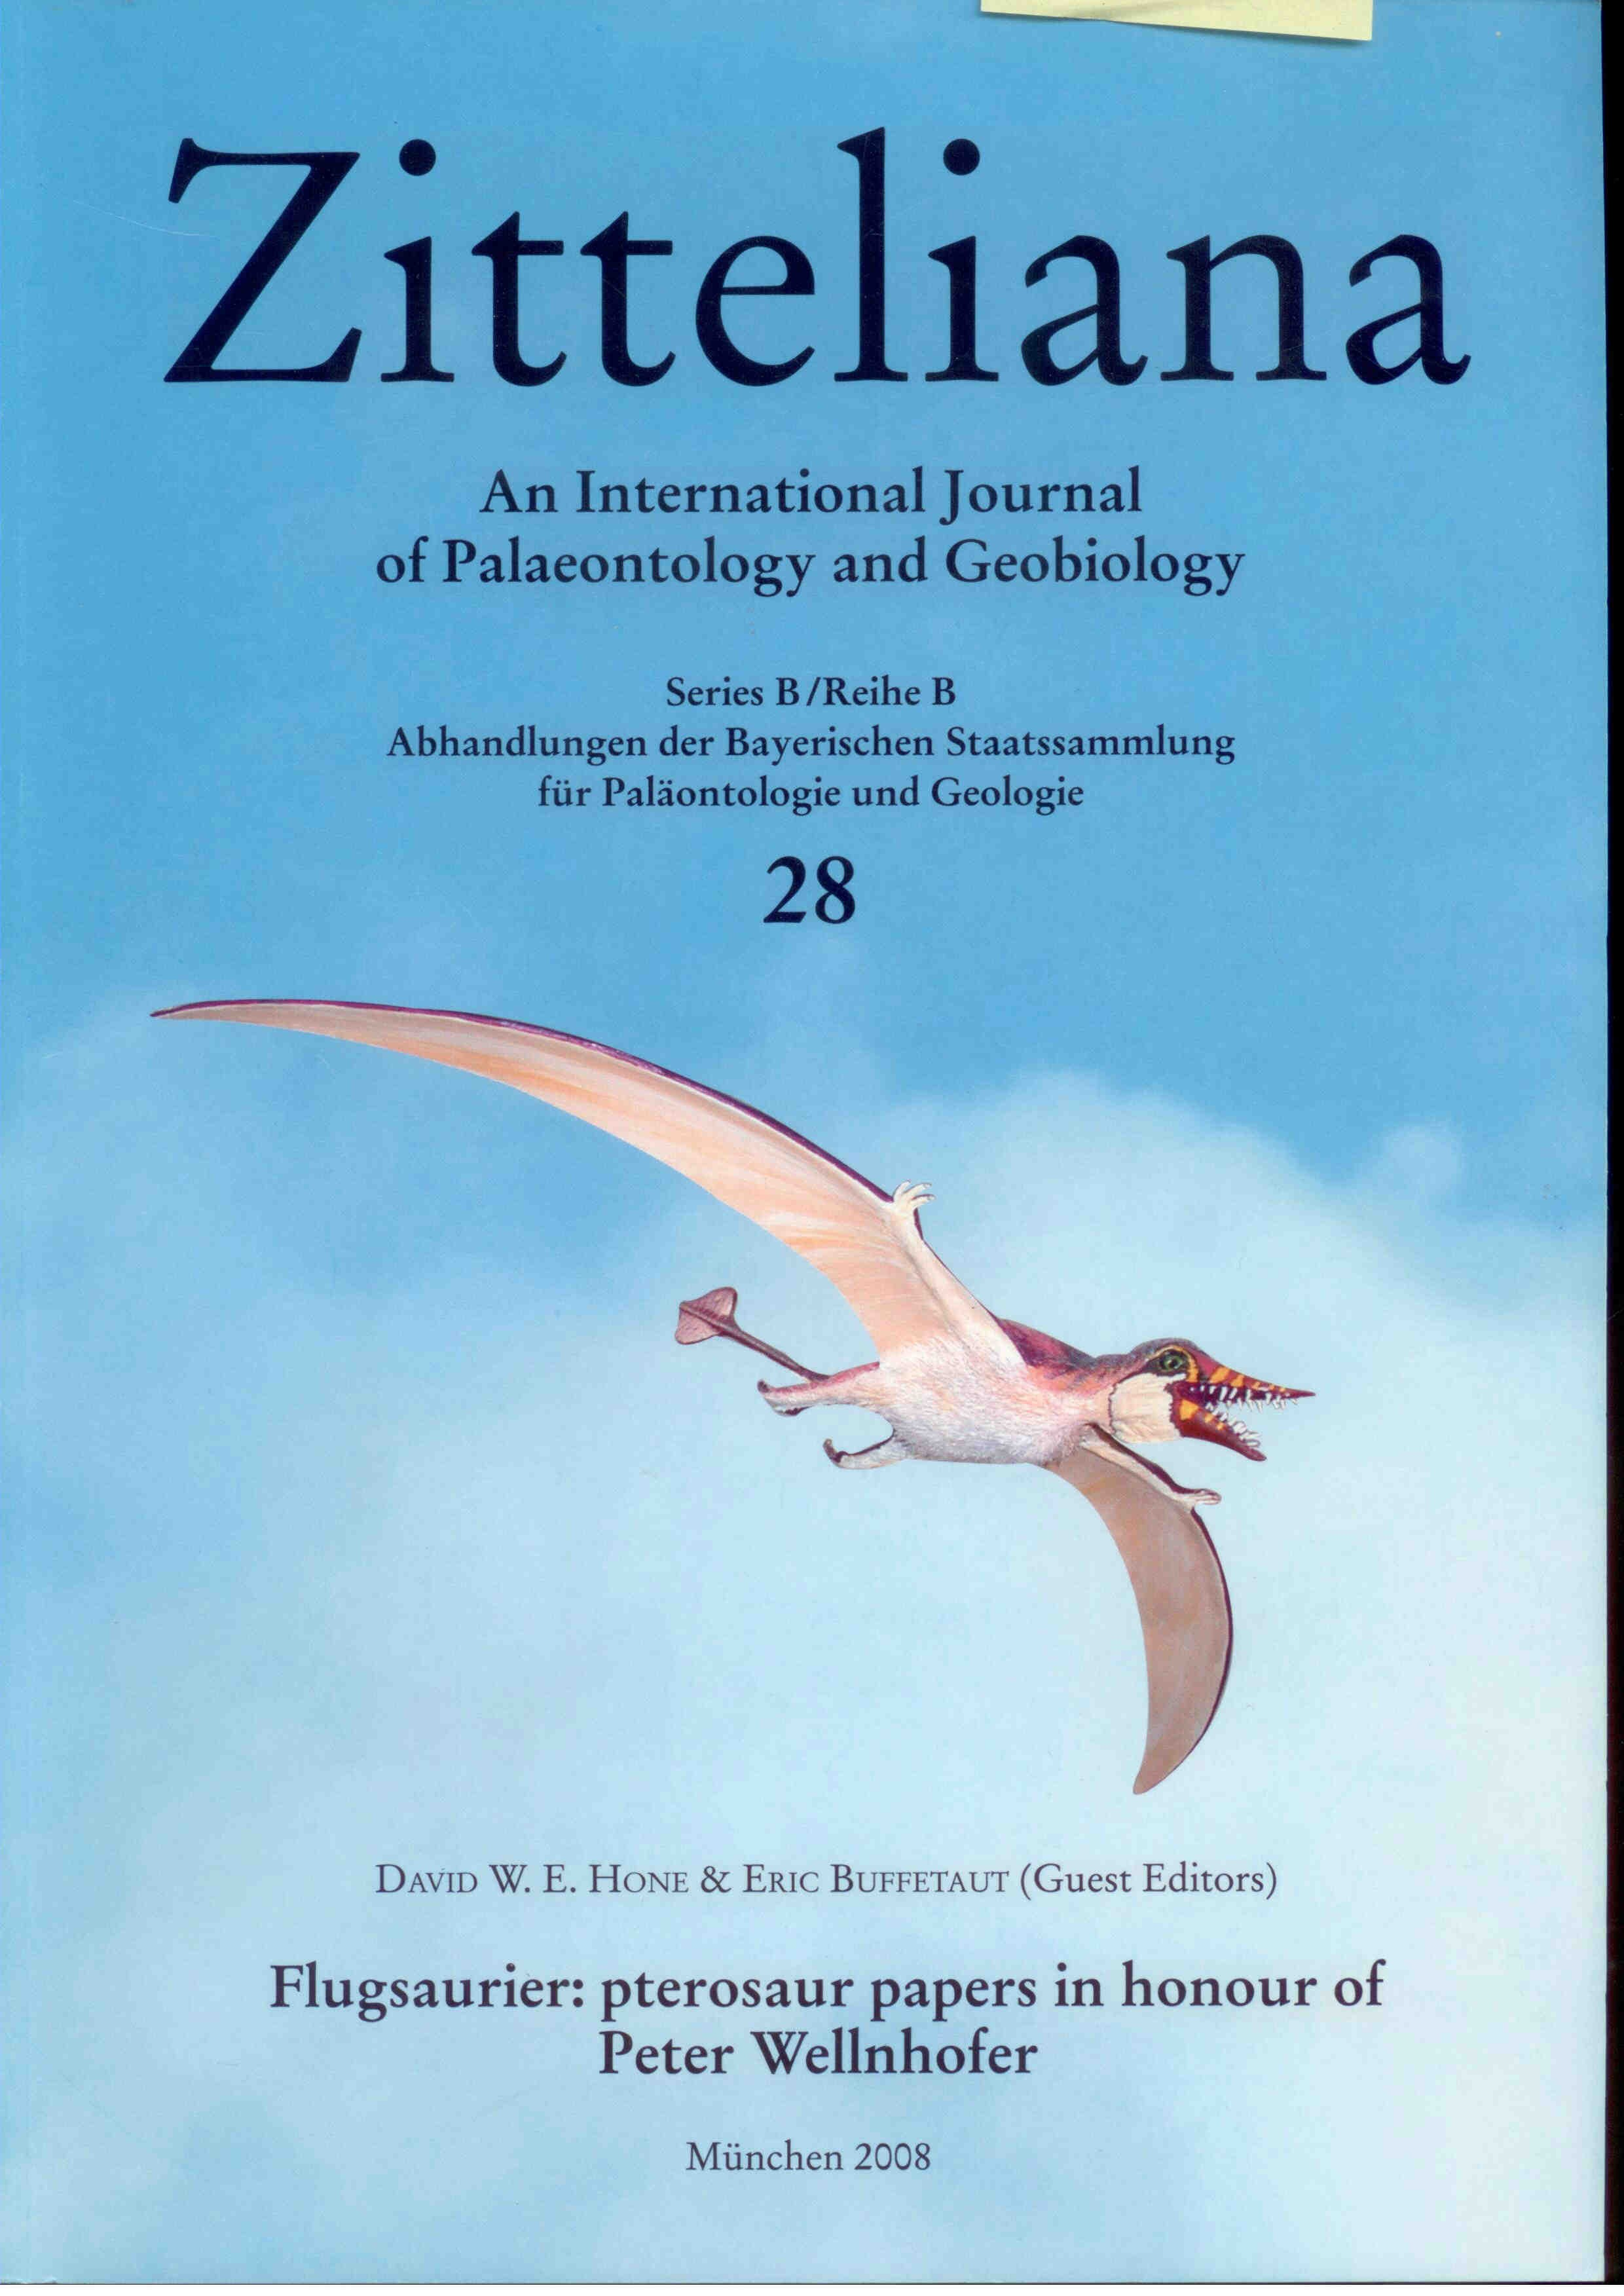 Hone D.W.E., Buffetaut E.: Flugsaurier: pterosaur papers in honour of Peter Wellnhofer.  ZITTELIANA 28